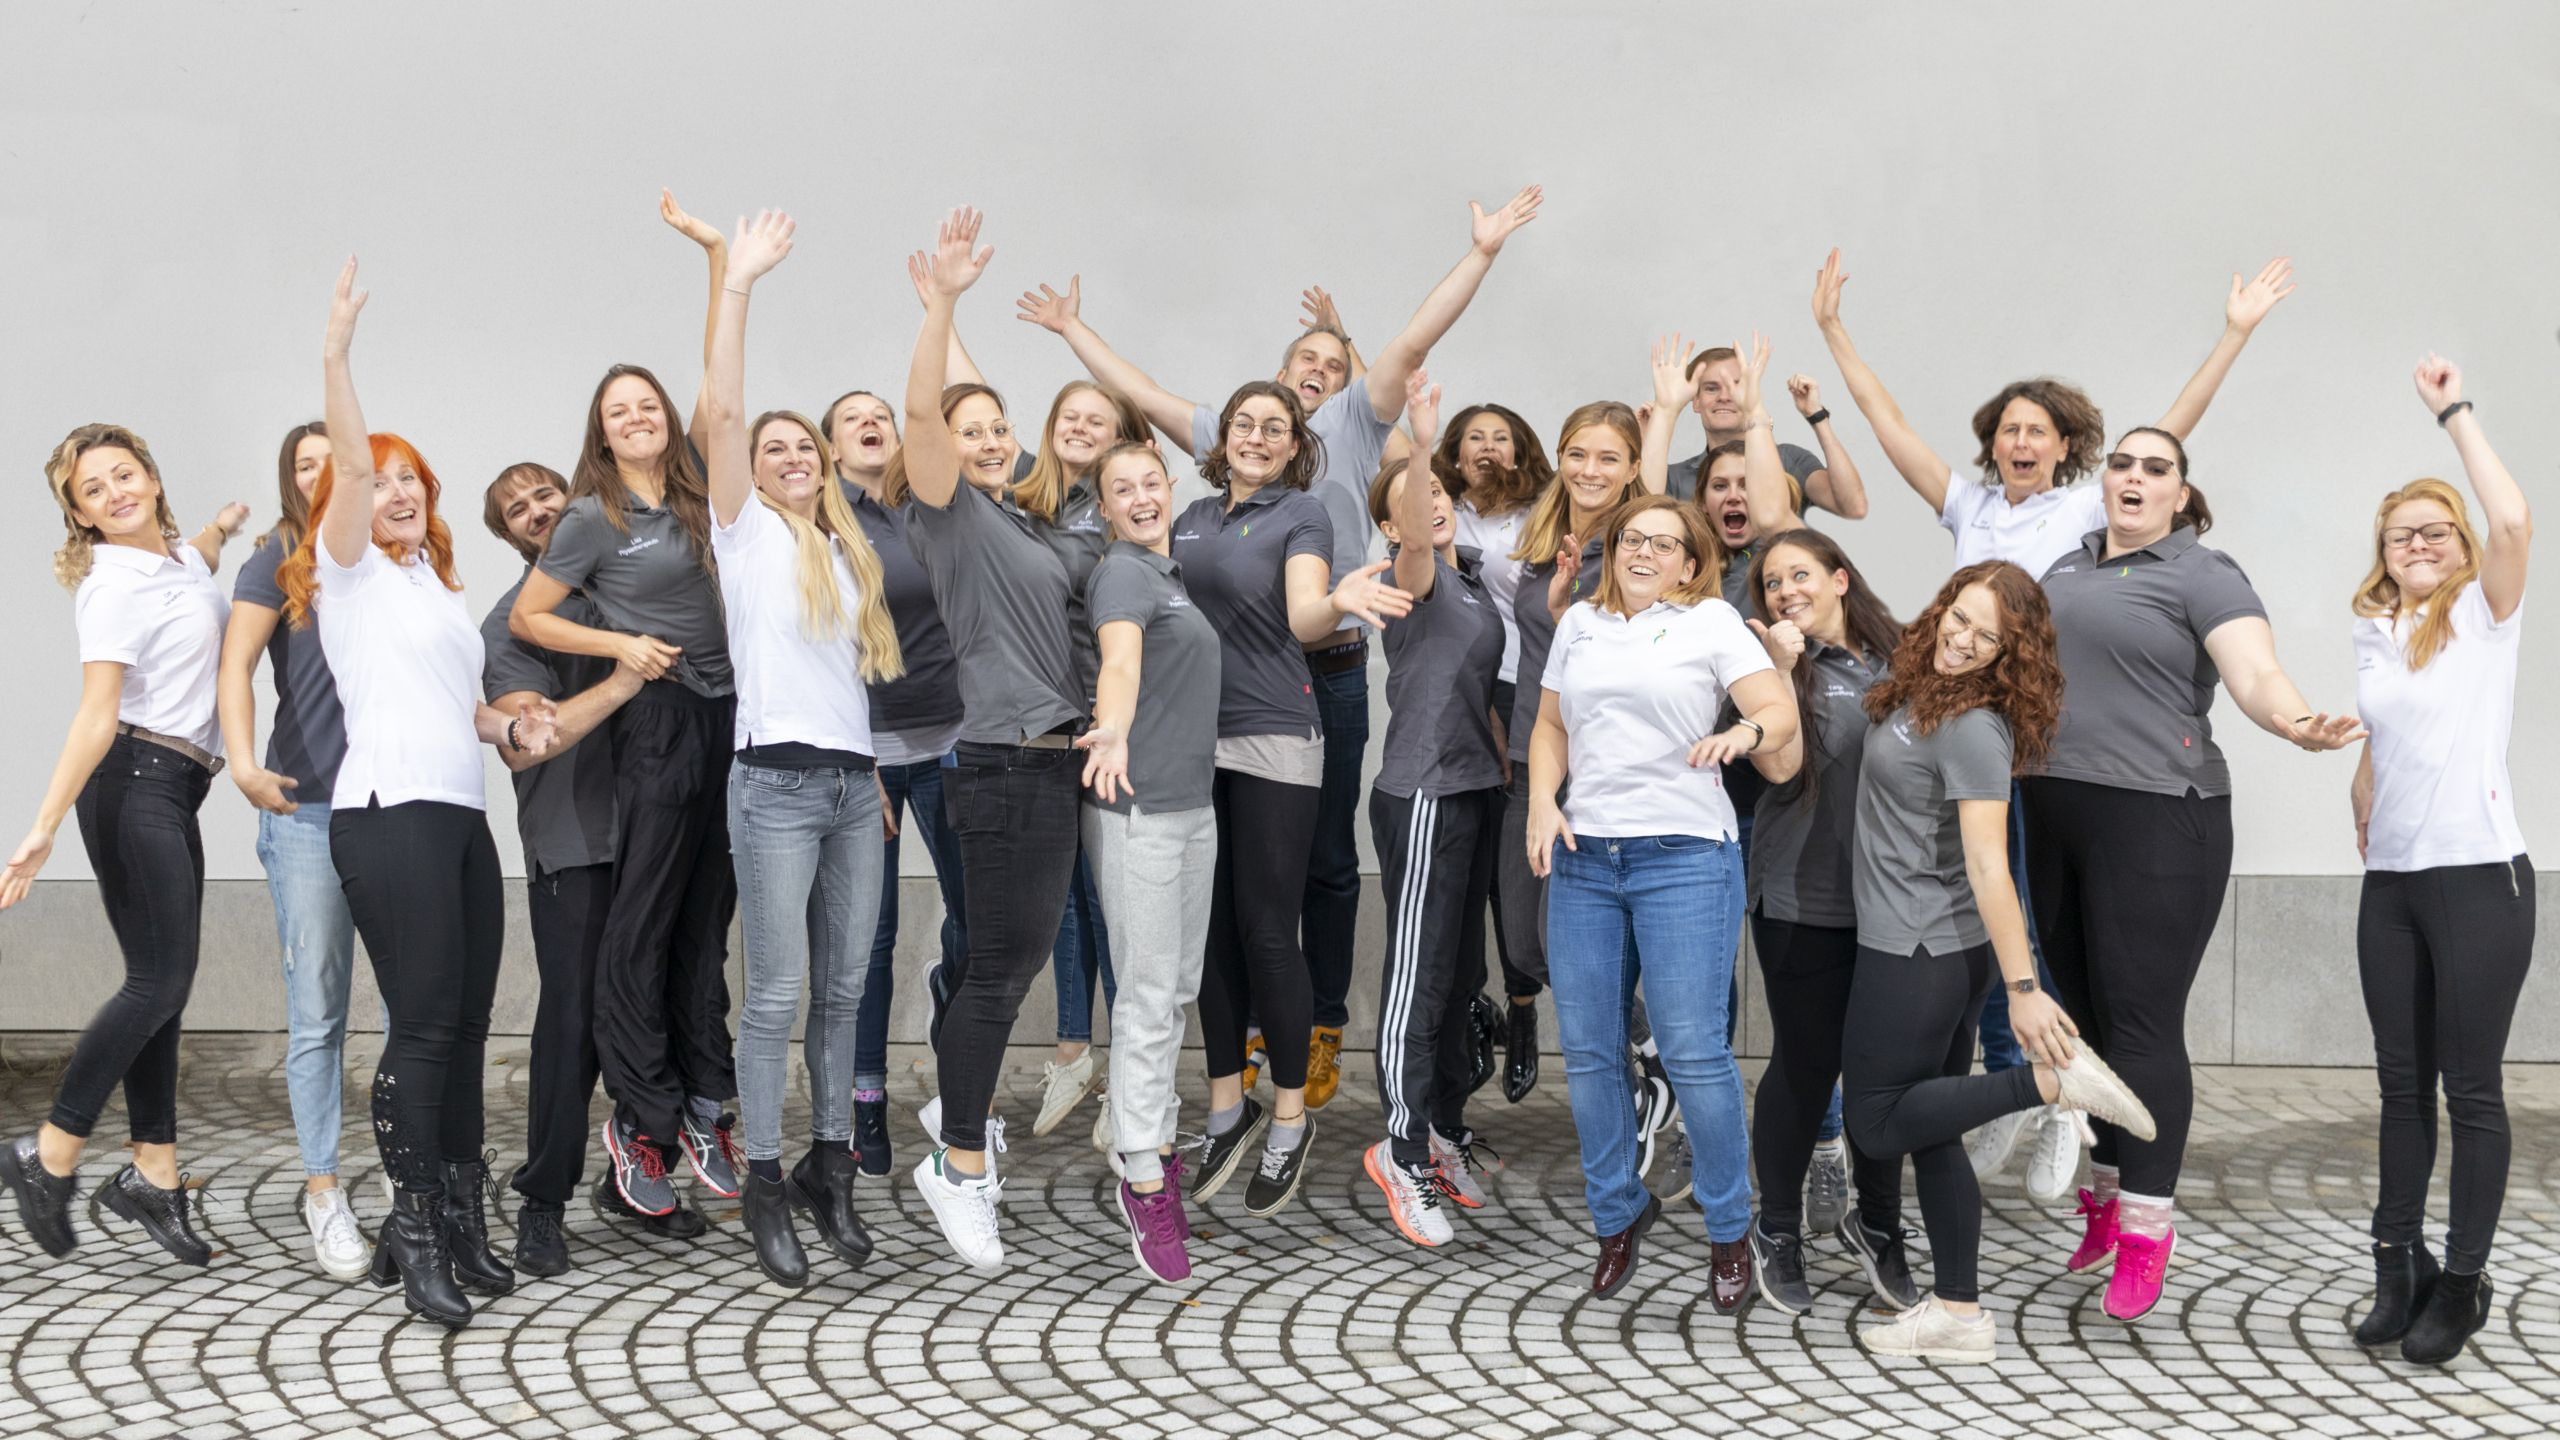 PhysioKonzept   Physiotherapie   Wellness   Fintesskurse - Team